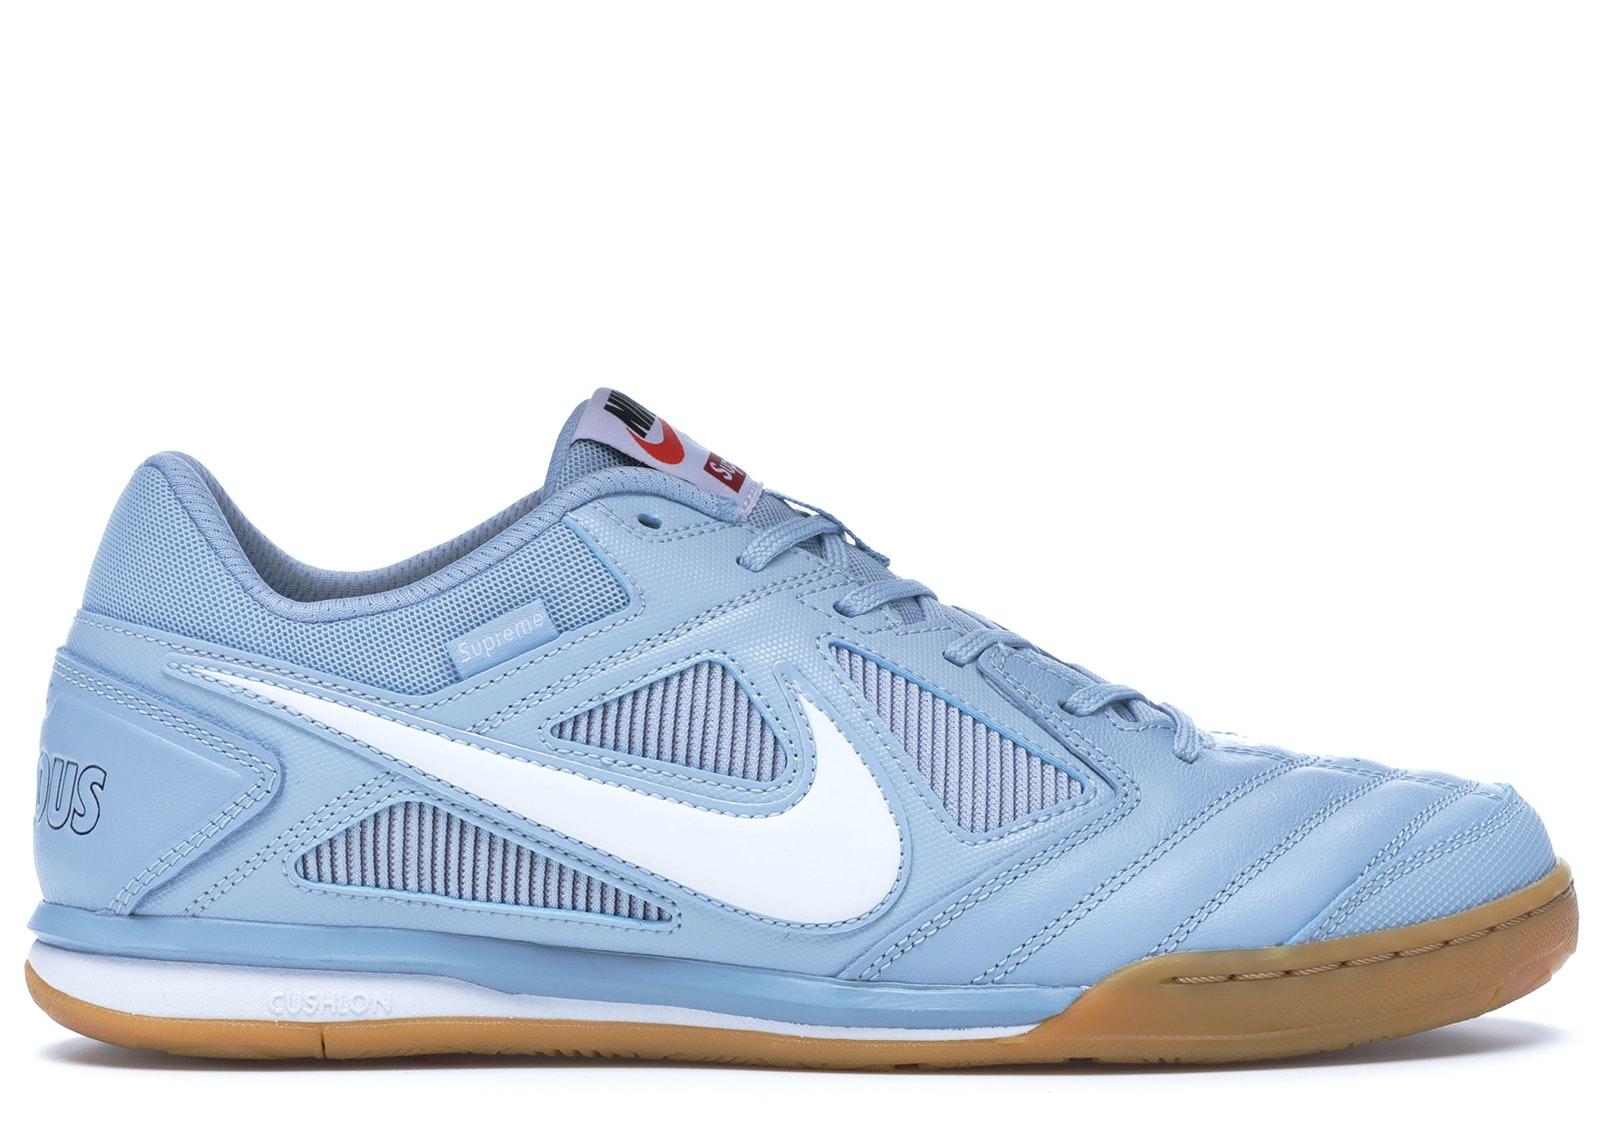 Nike SB Gato Supreme Light Armory Blue